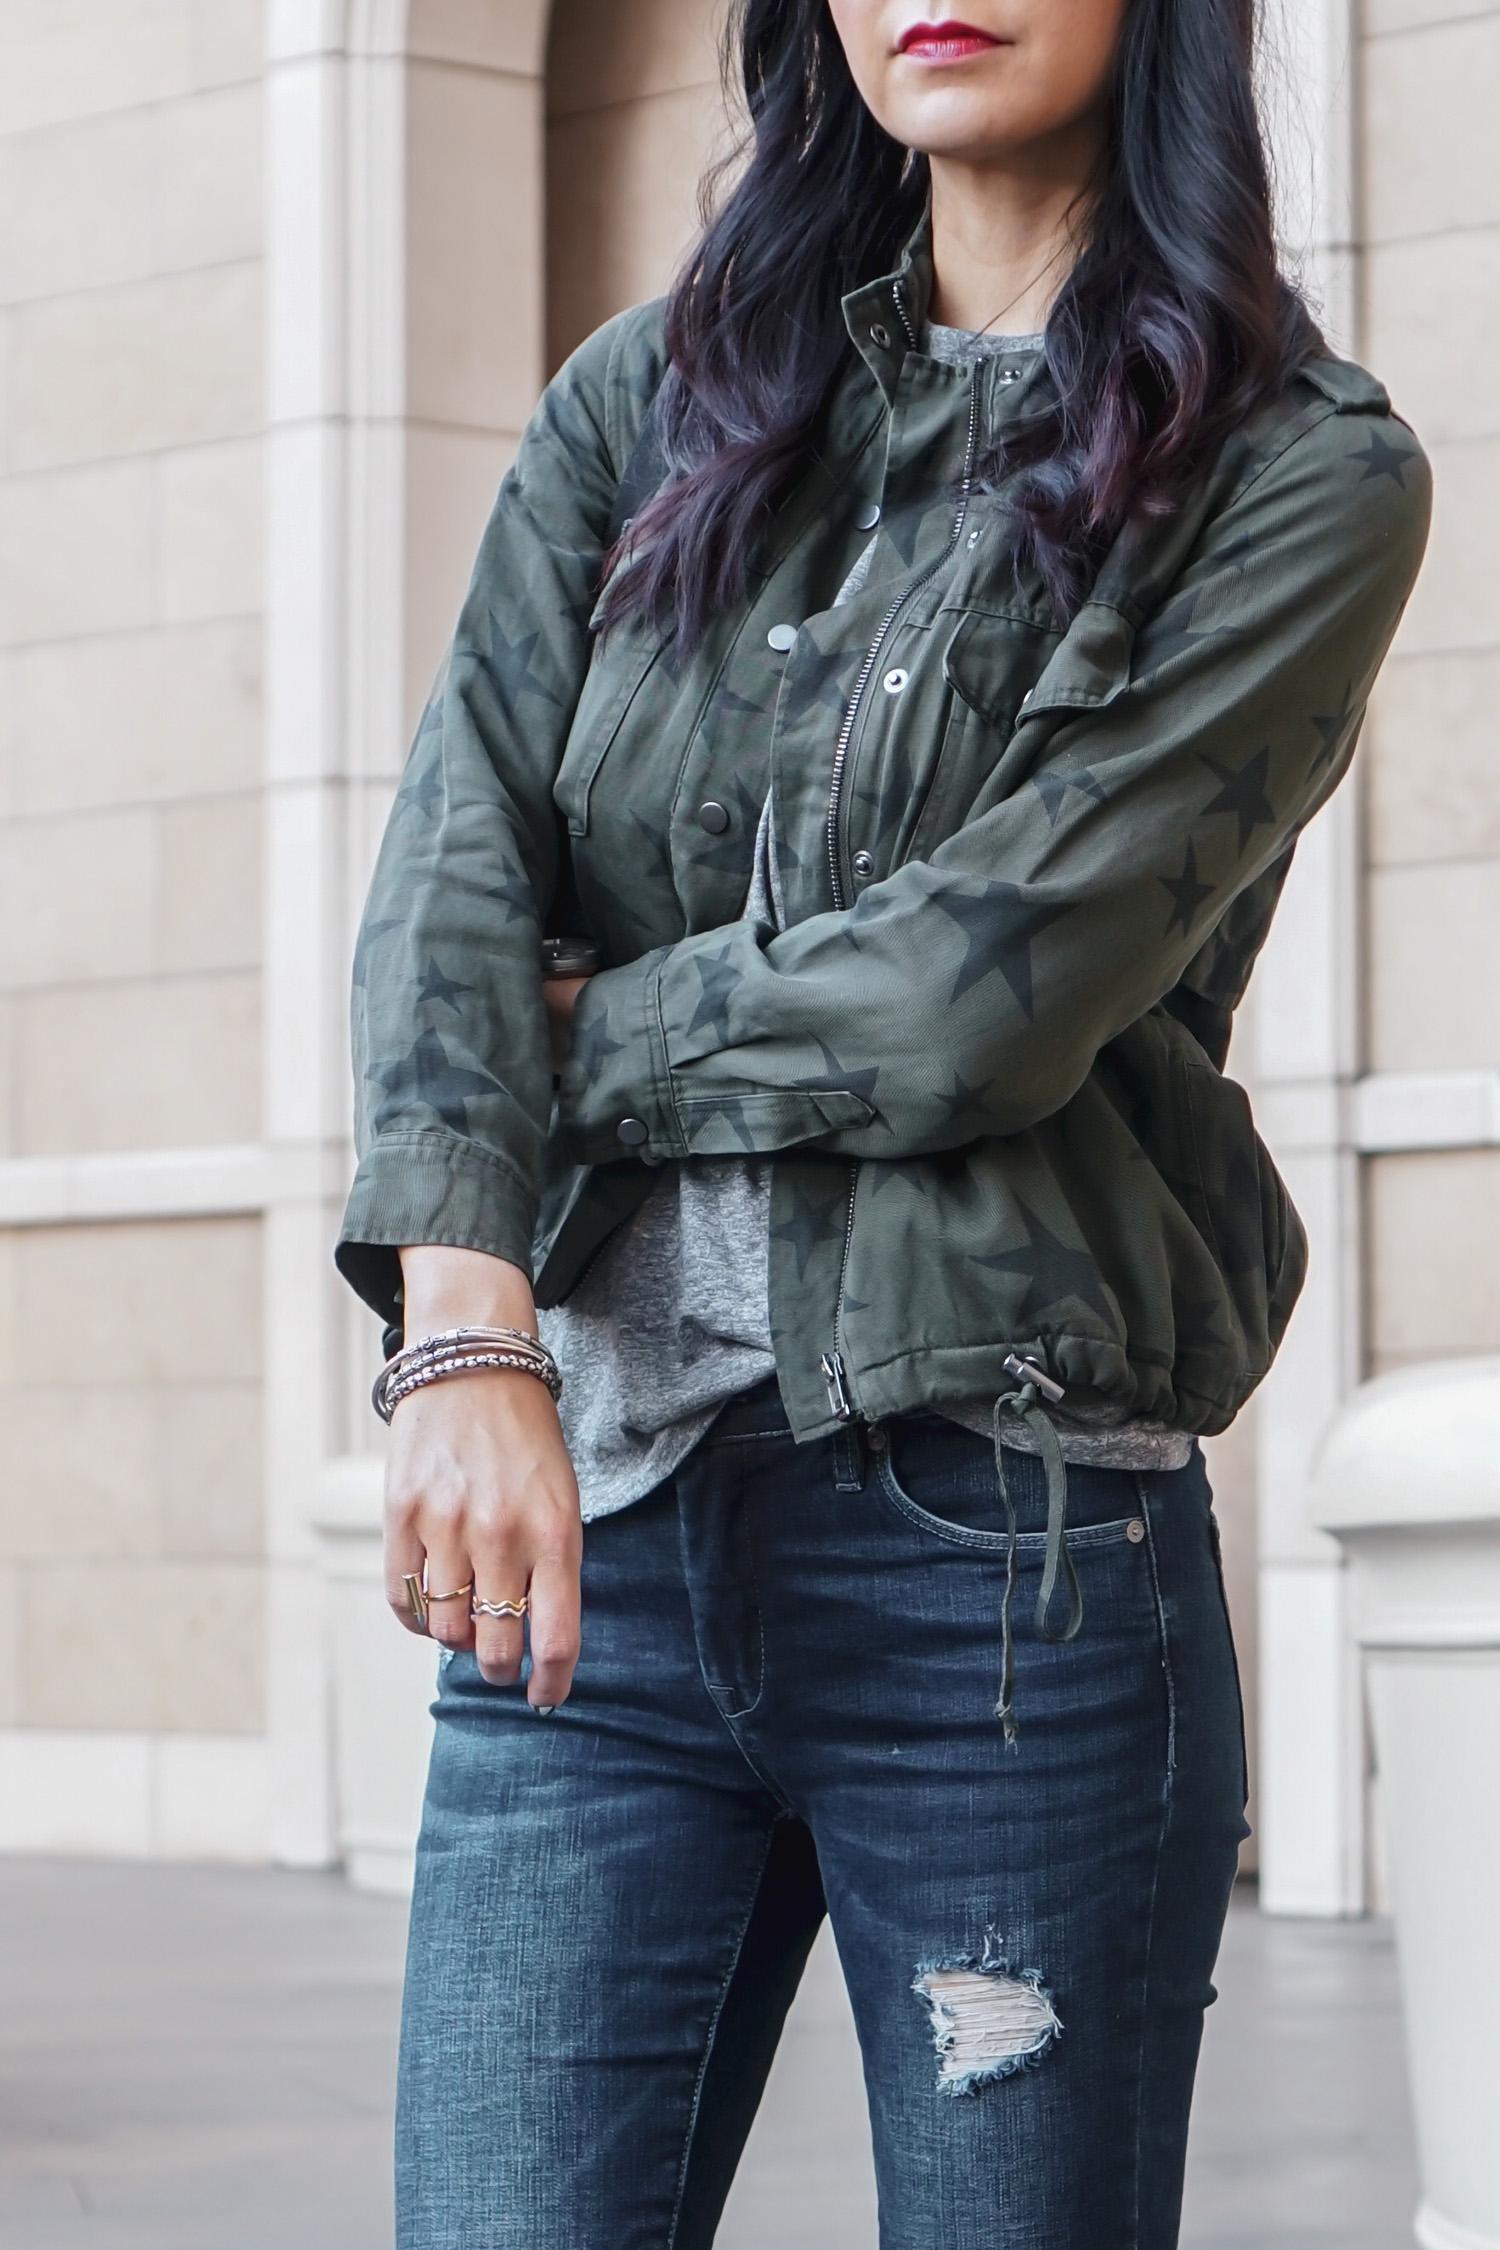 Rails Star Jacket, Modern Vice Boots, Treasure & Bond Bag